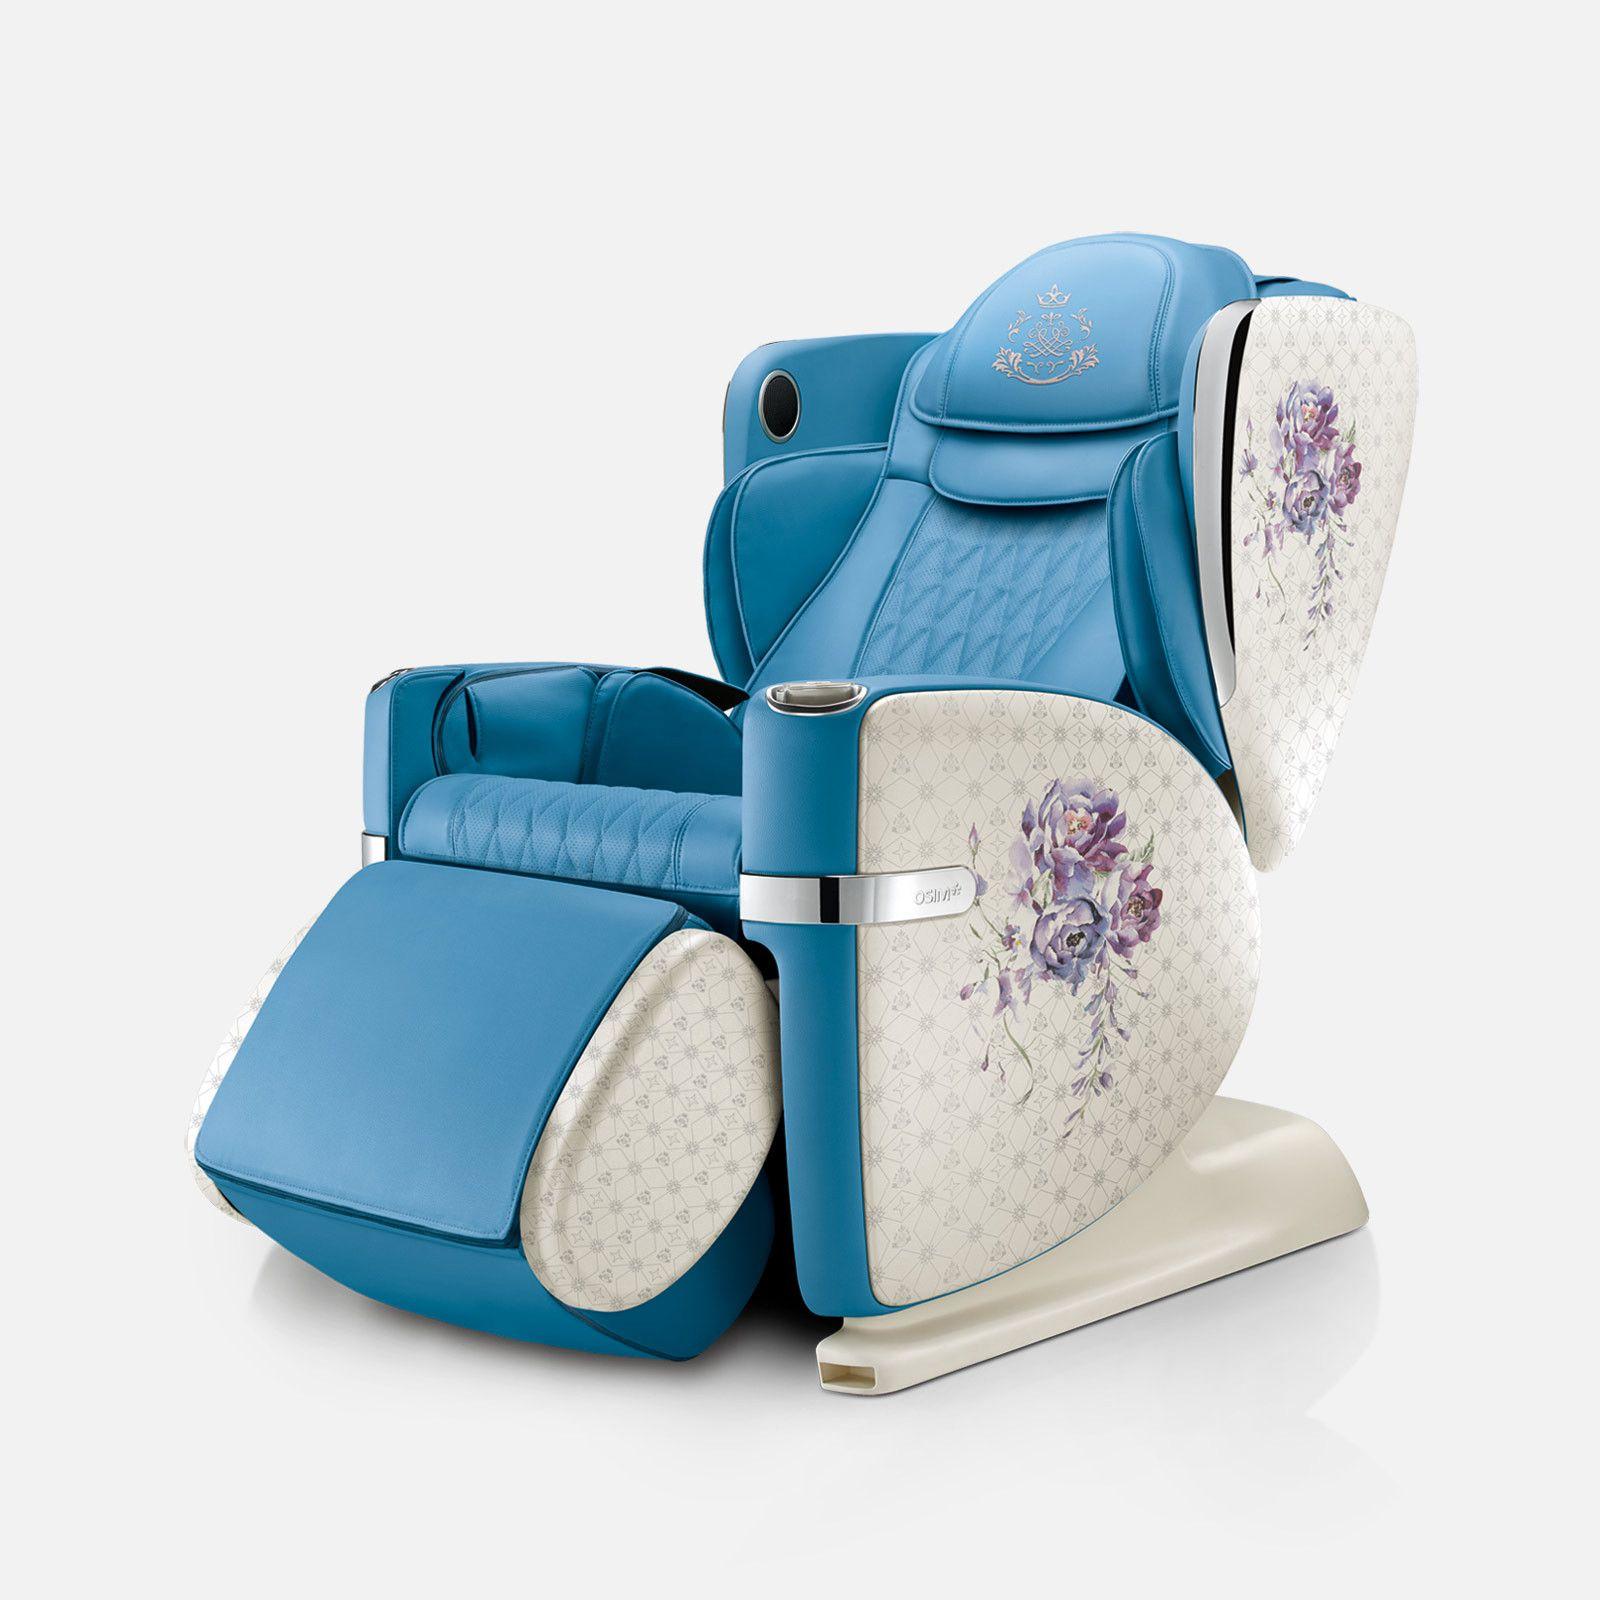 Ulove2 Full Body Massager Chair Body Massage Deep Tissue Massage Massage